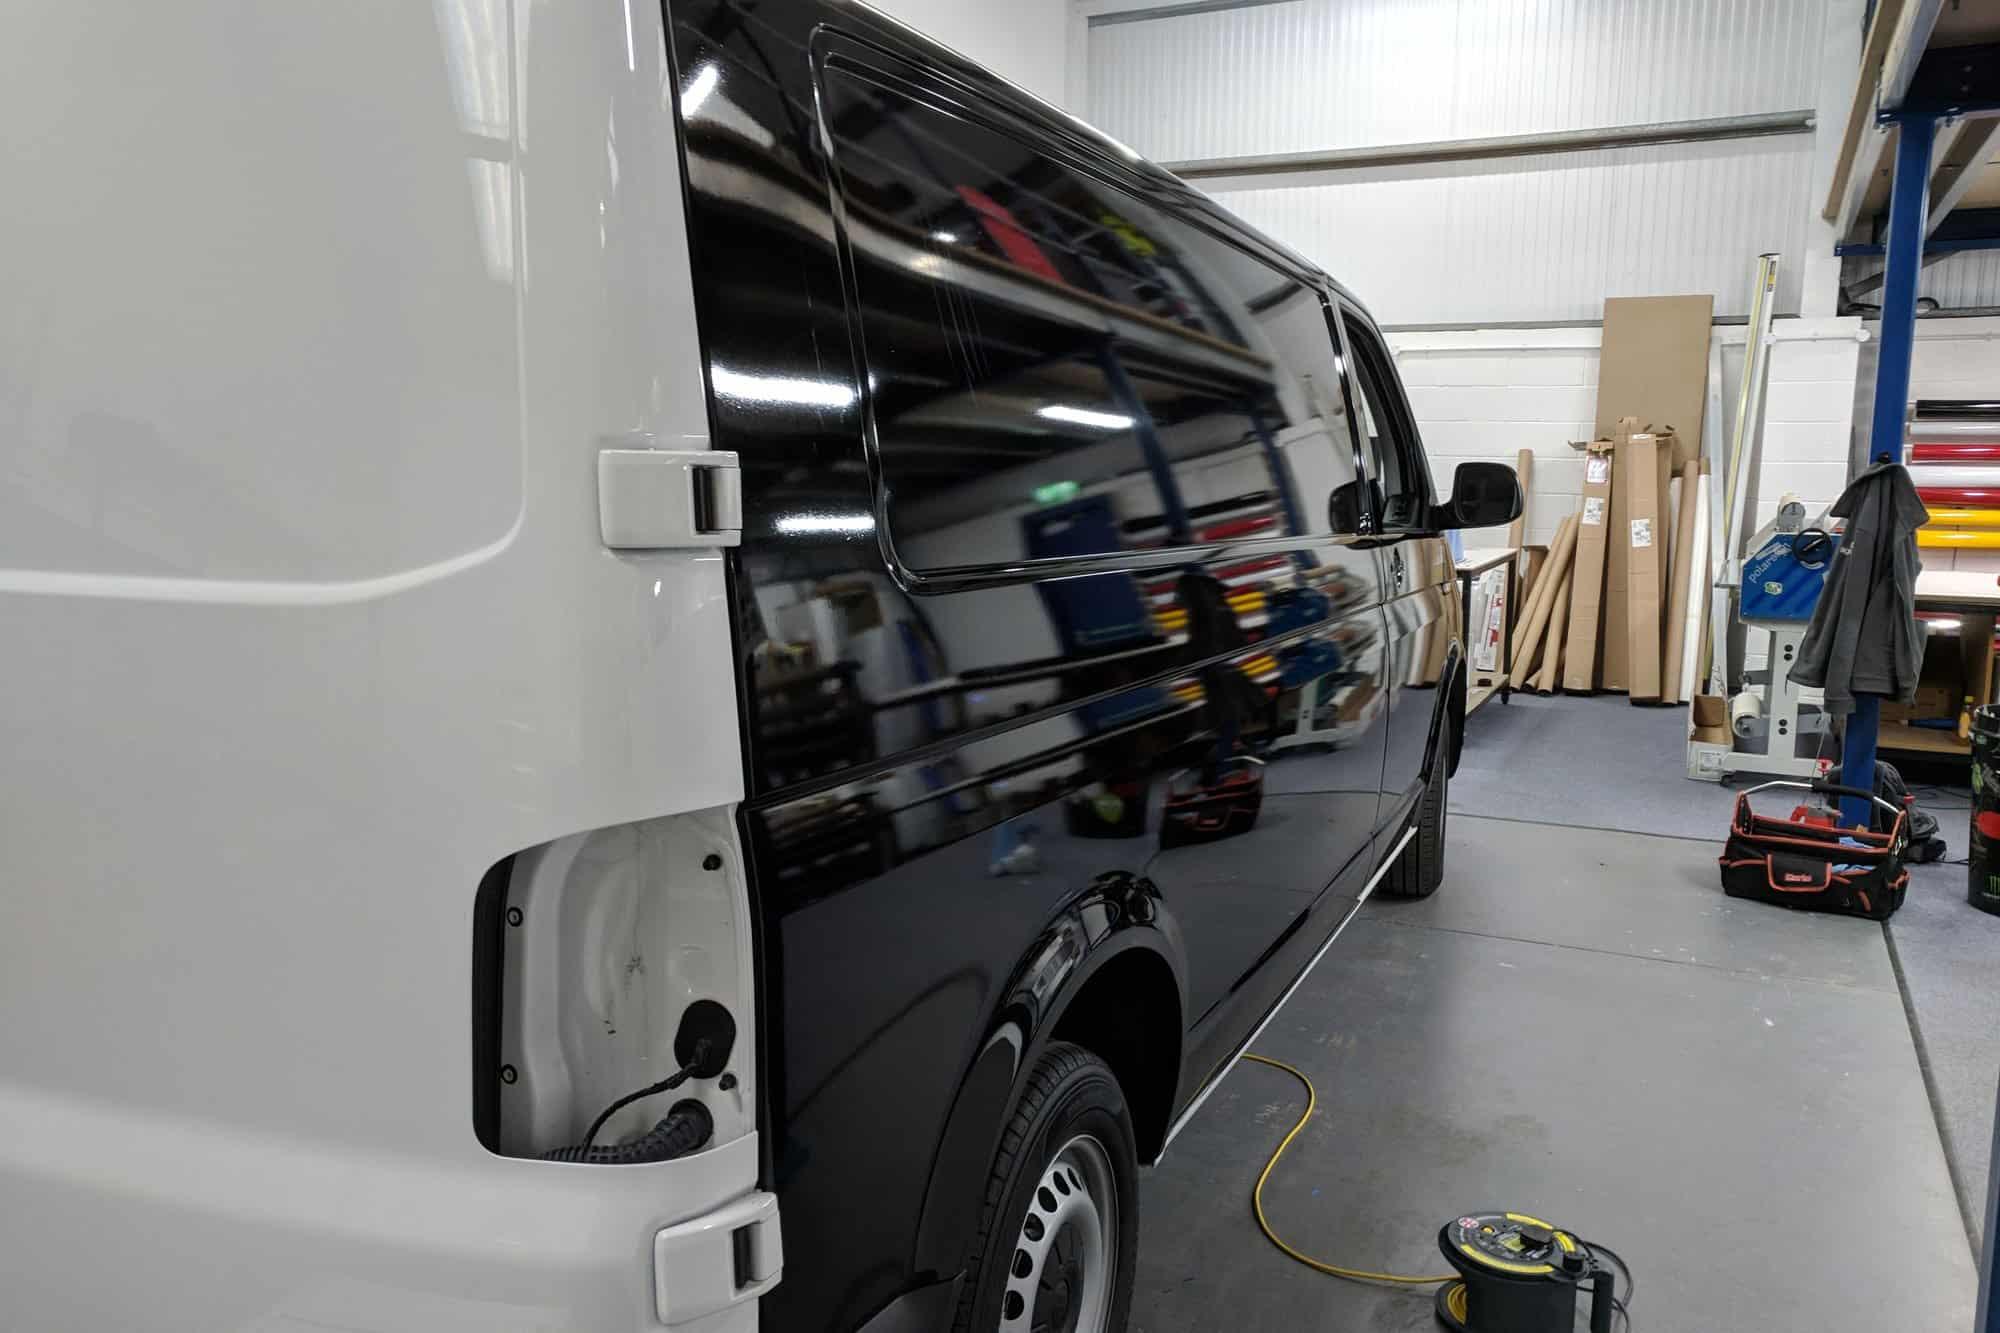 Full Vehicle Wrap in Avery Supreme Black